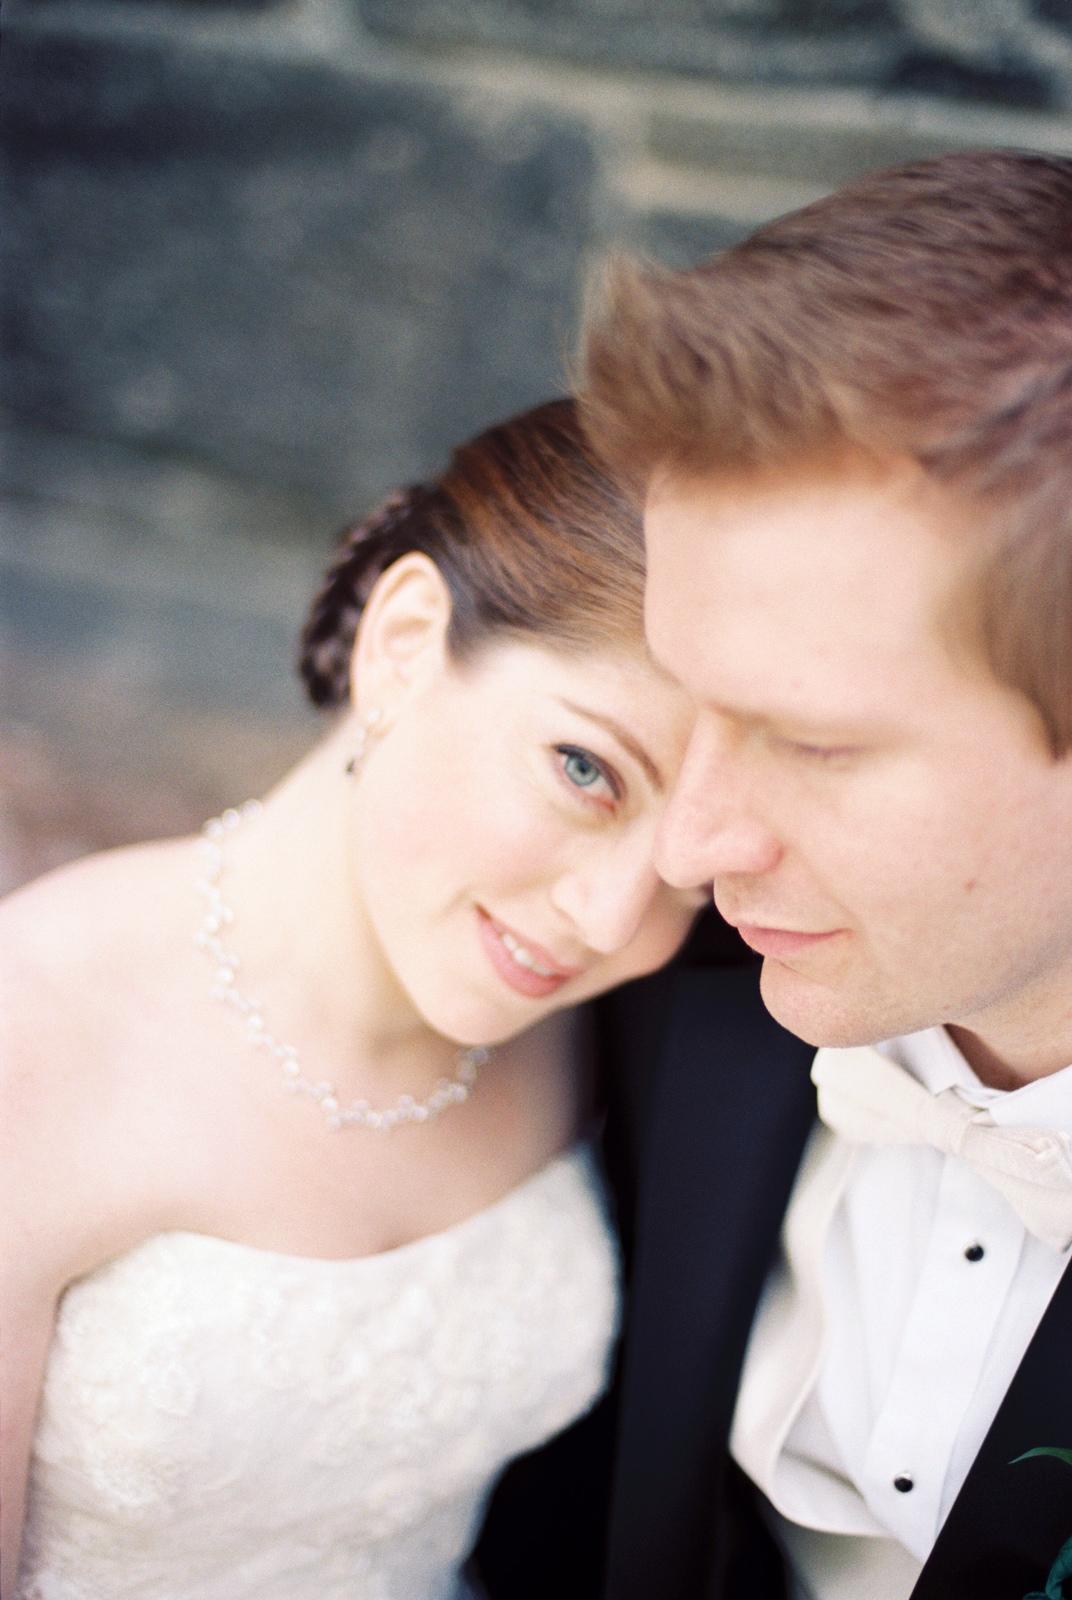 mamaroneck beach yacht club wedding couple by wendy g photography